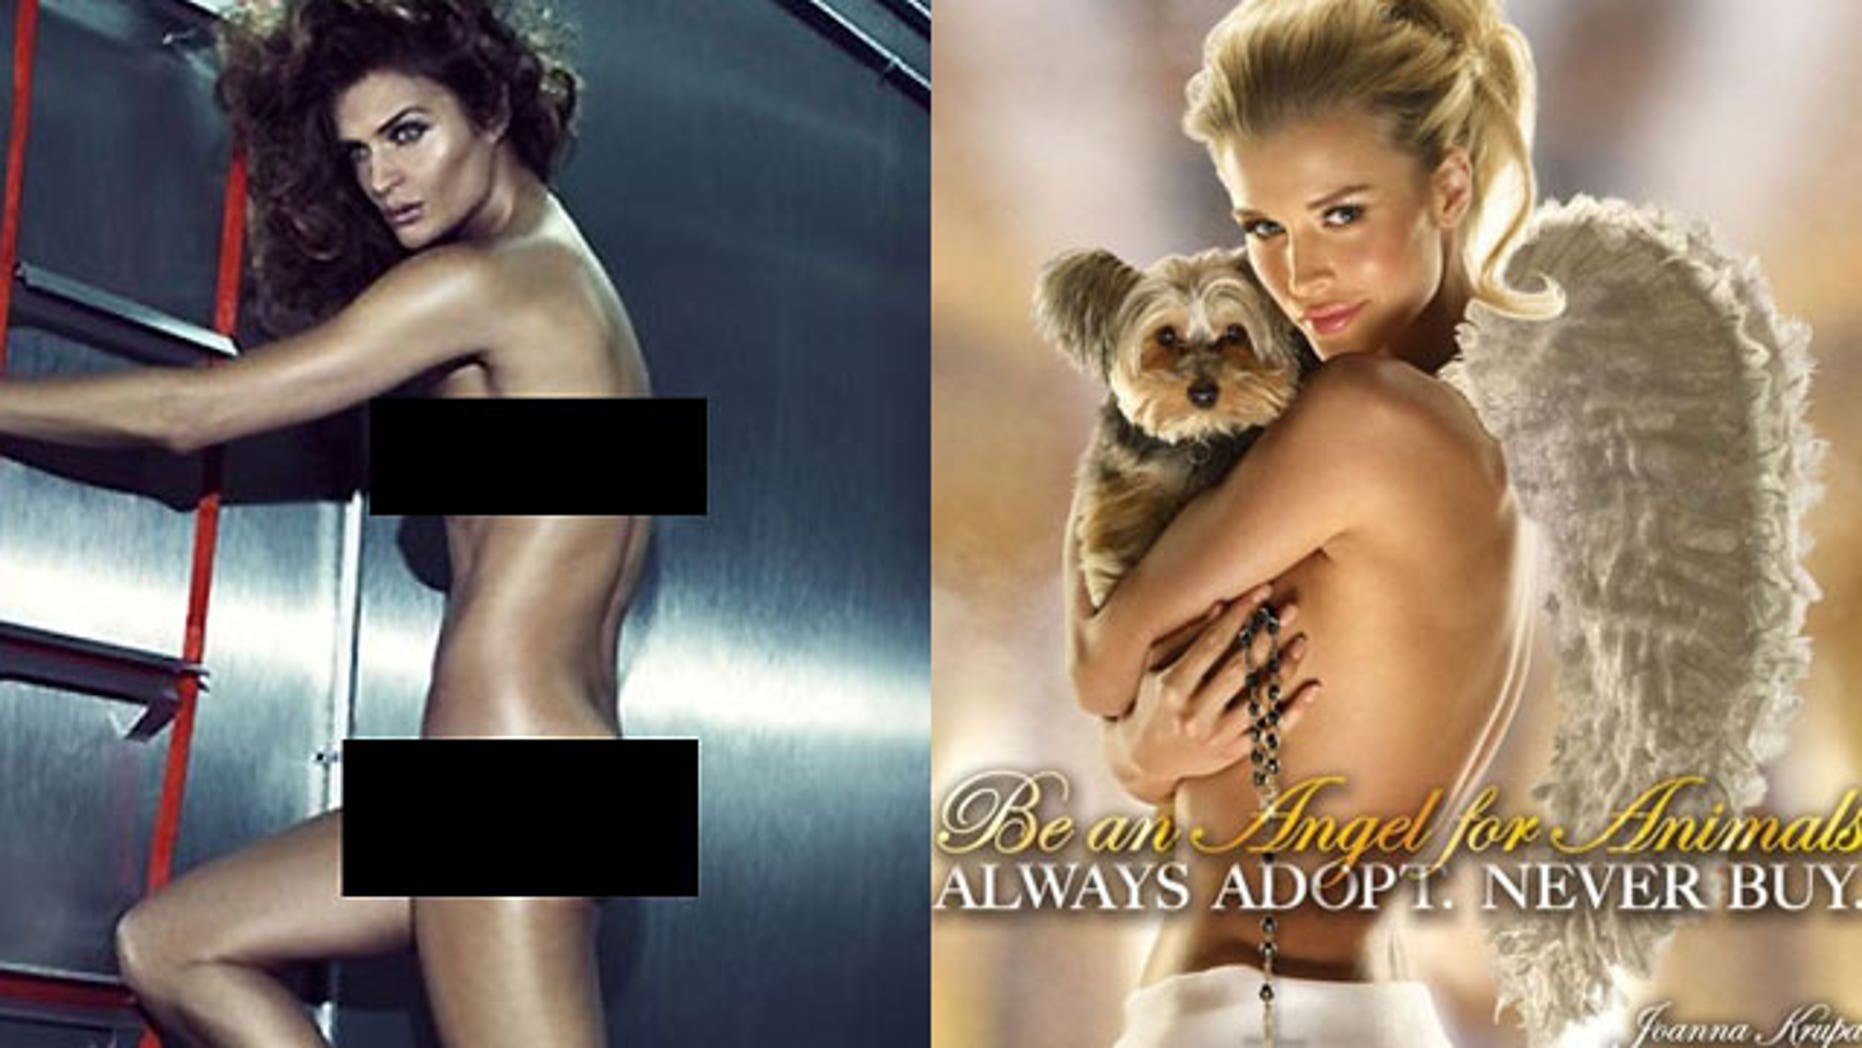 Helena Christensen in a new Reebok ad (left) and Joanna Krupa for PETA